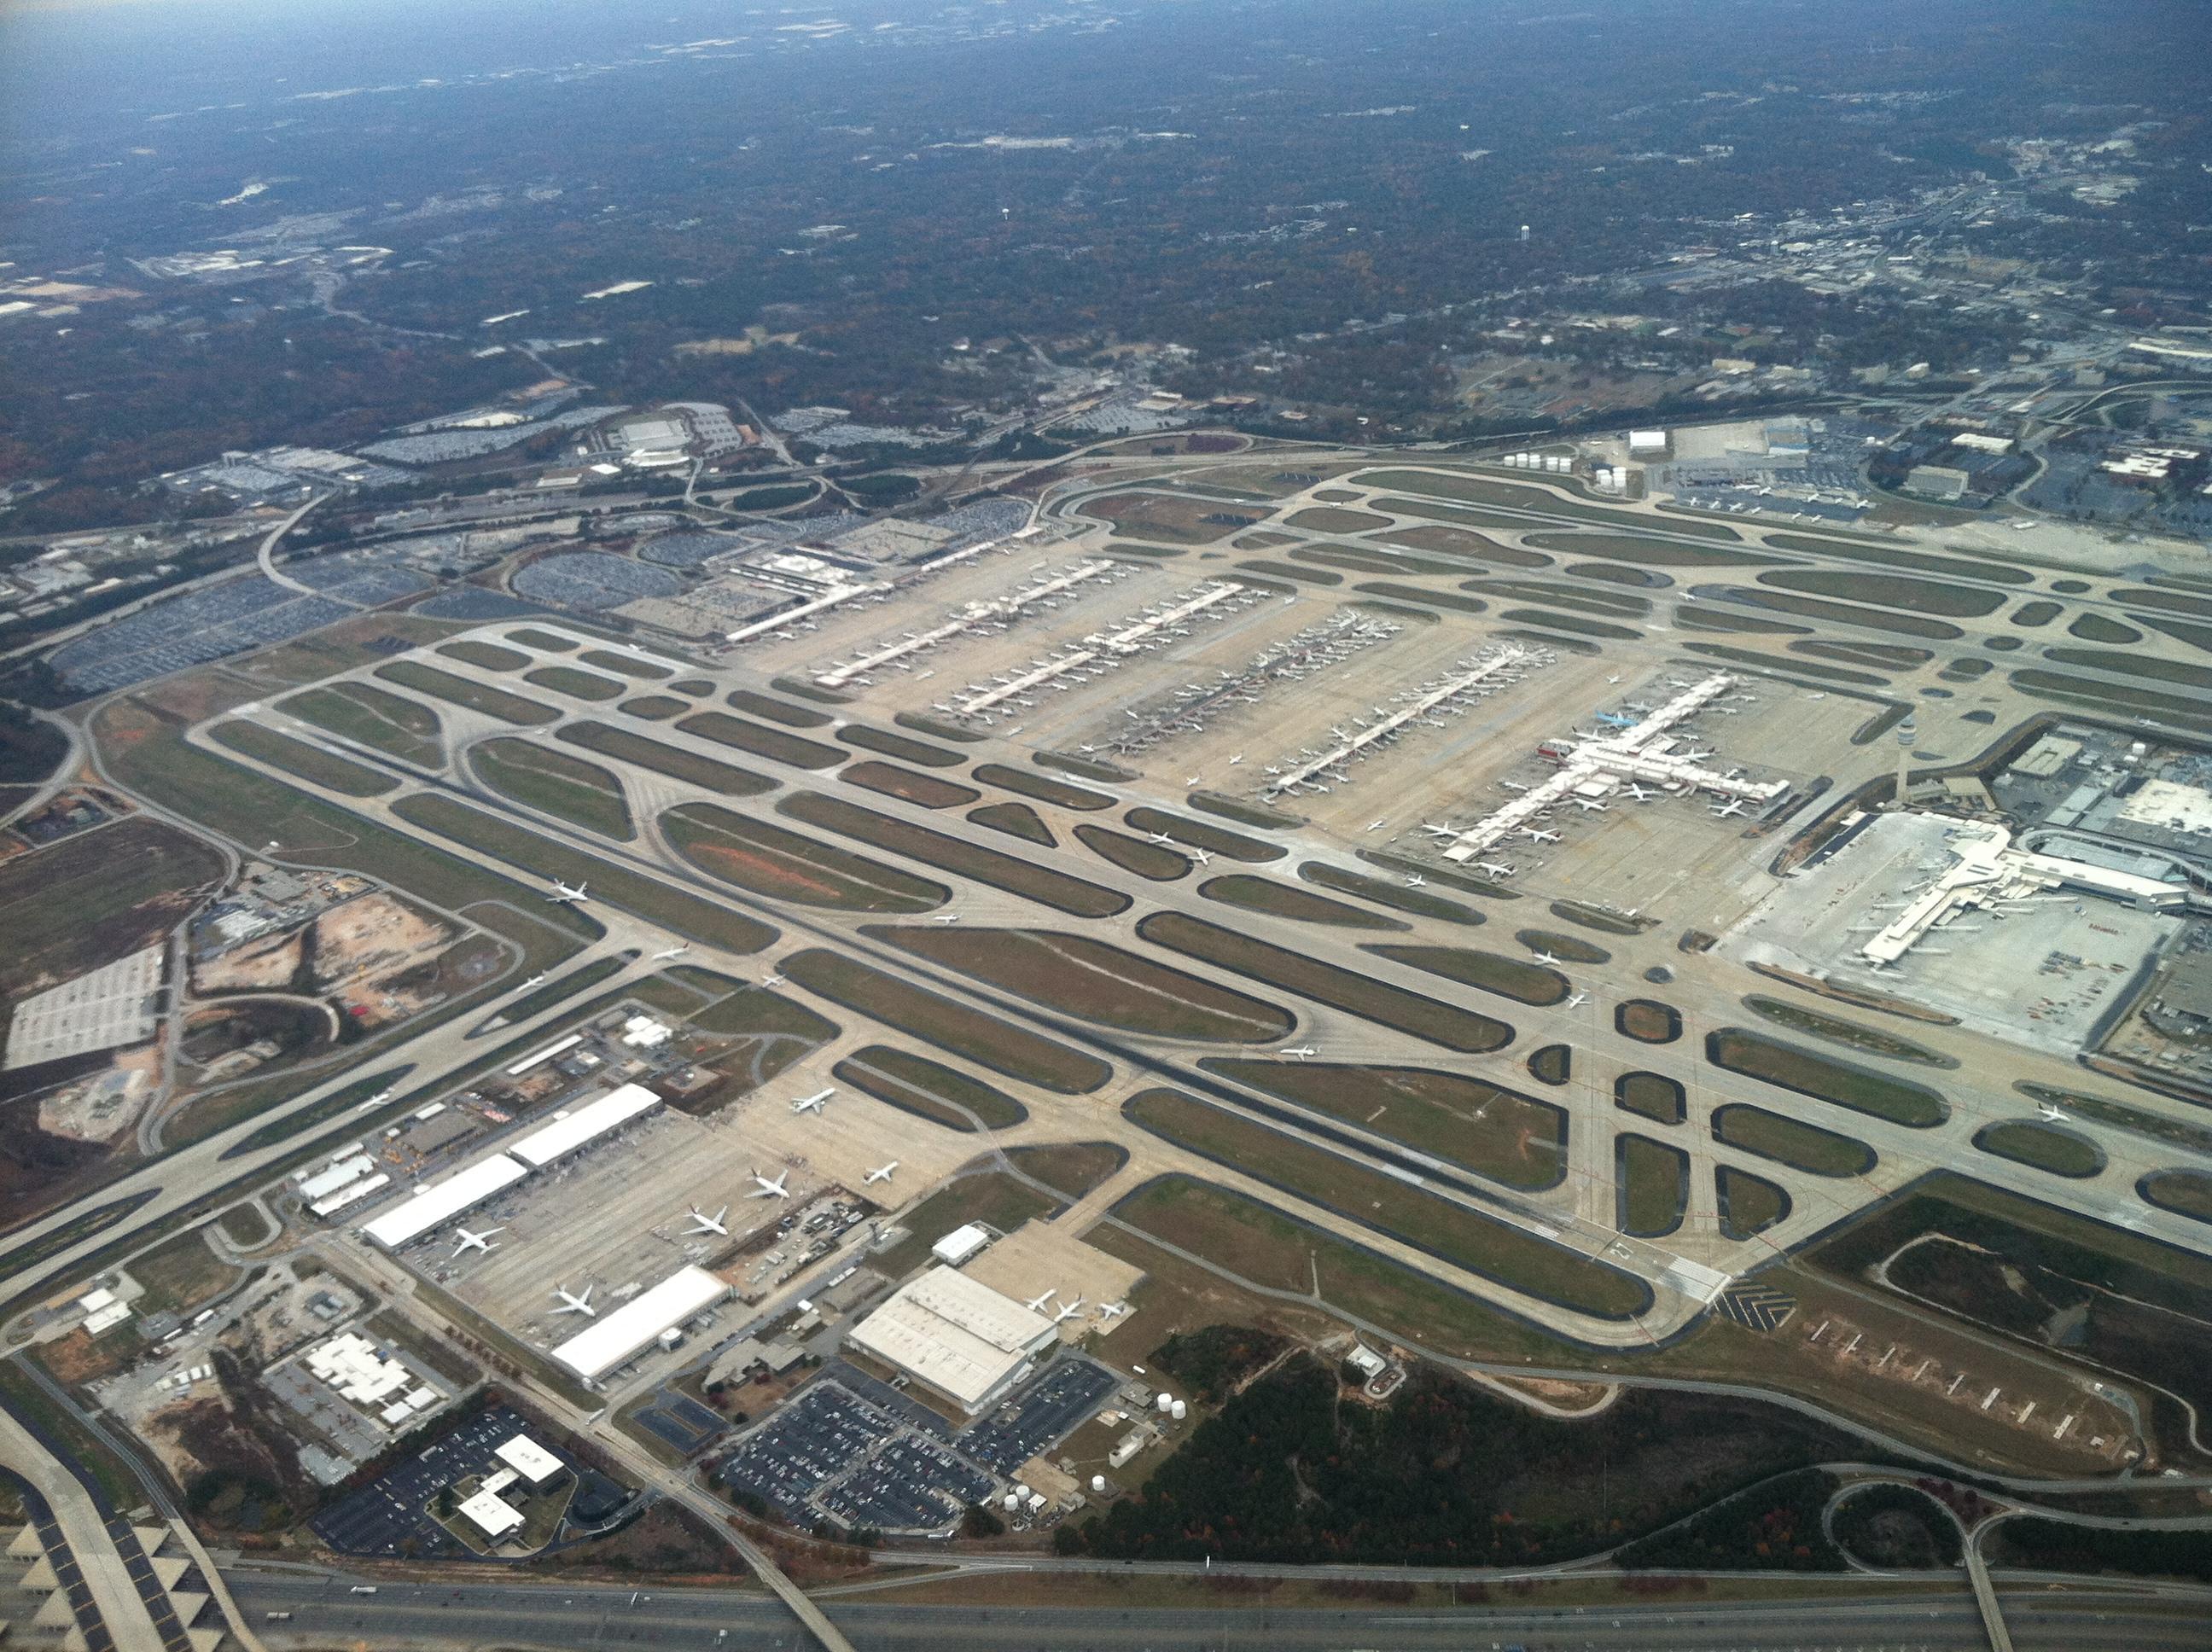 Brown bathroom curtain ideas - Atlanta International Airport Airport Images